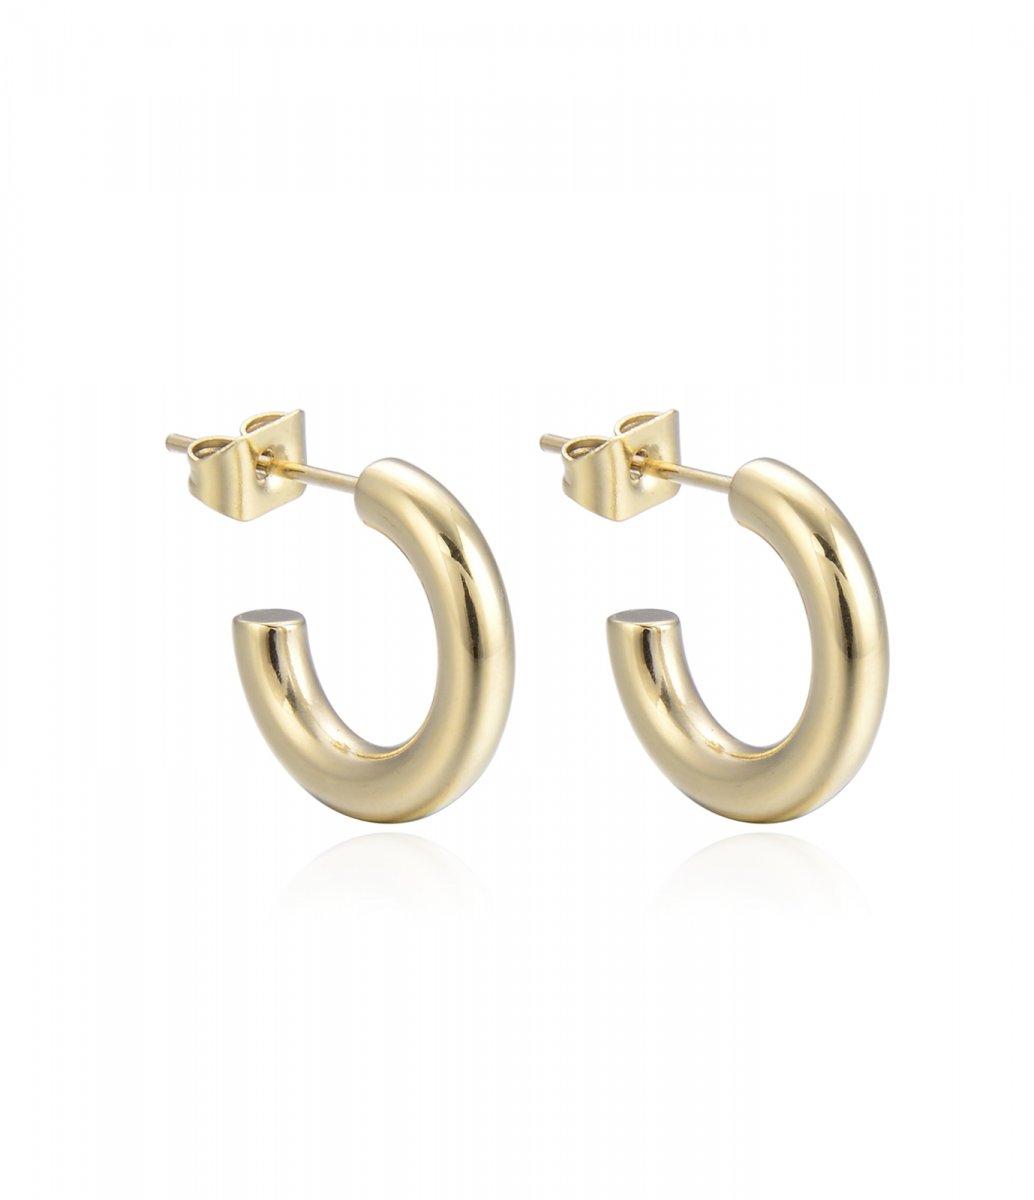 Artnr 912042 Hitch Earring Gold